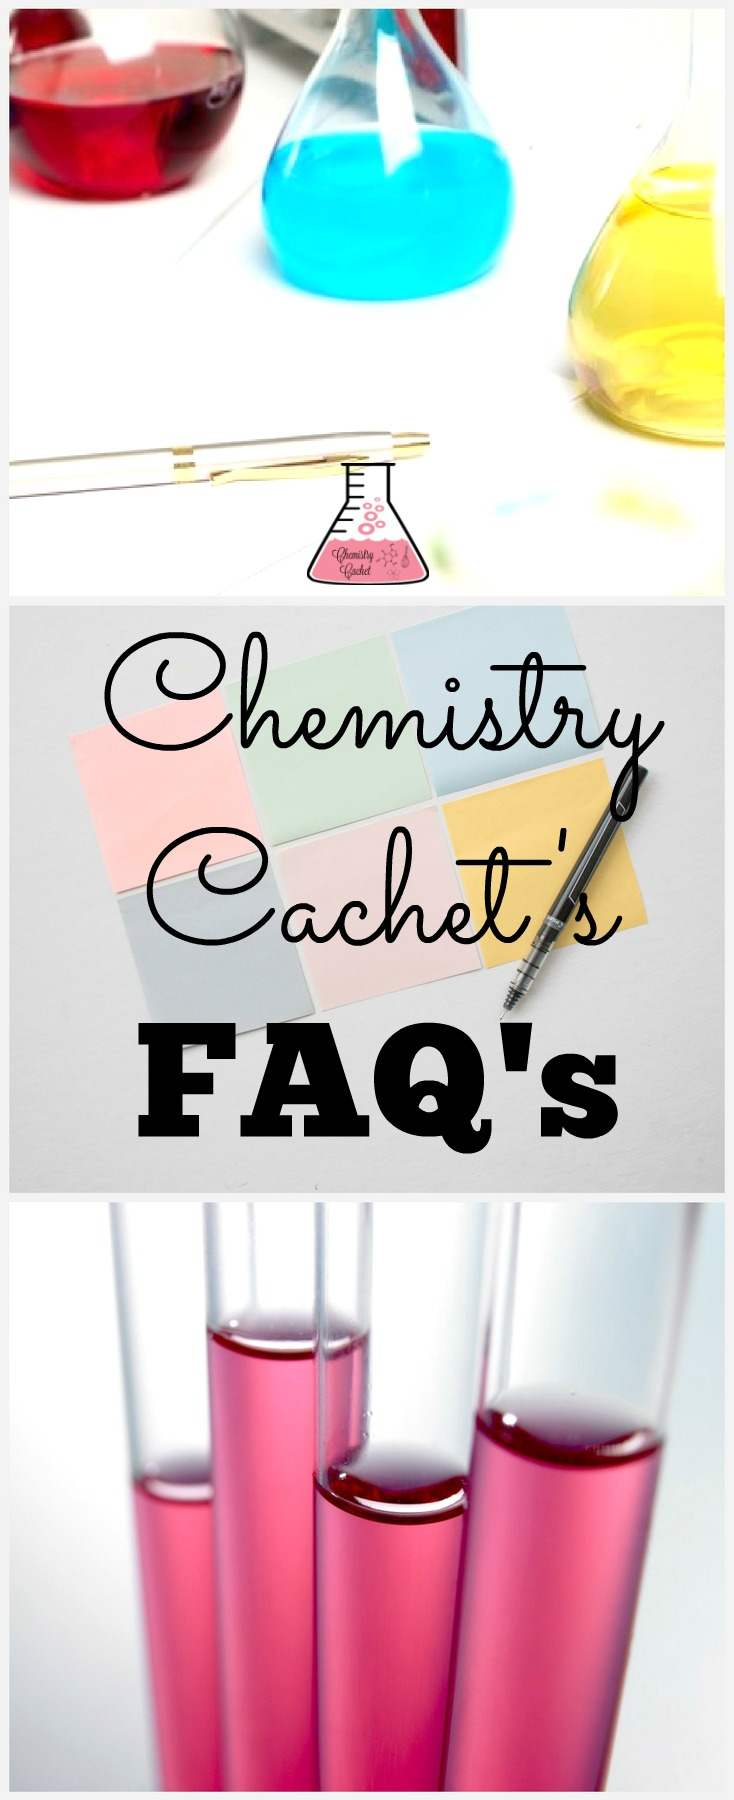 Chemistry Cachet's FAQ's